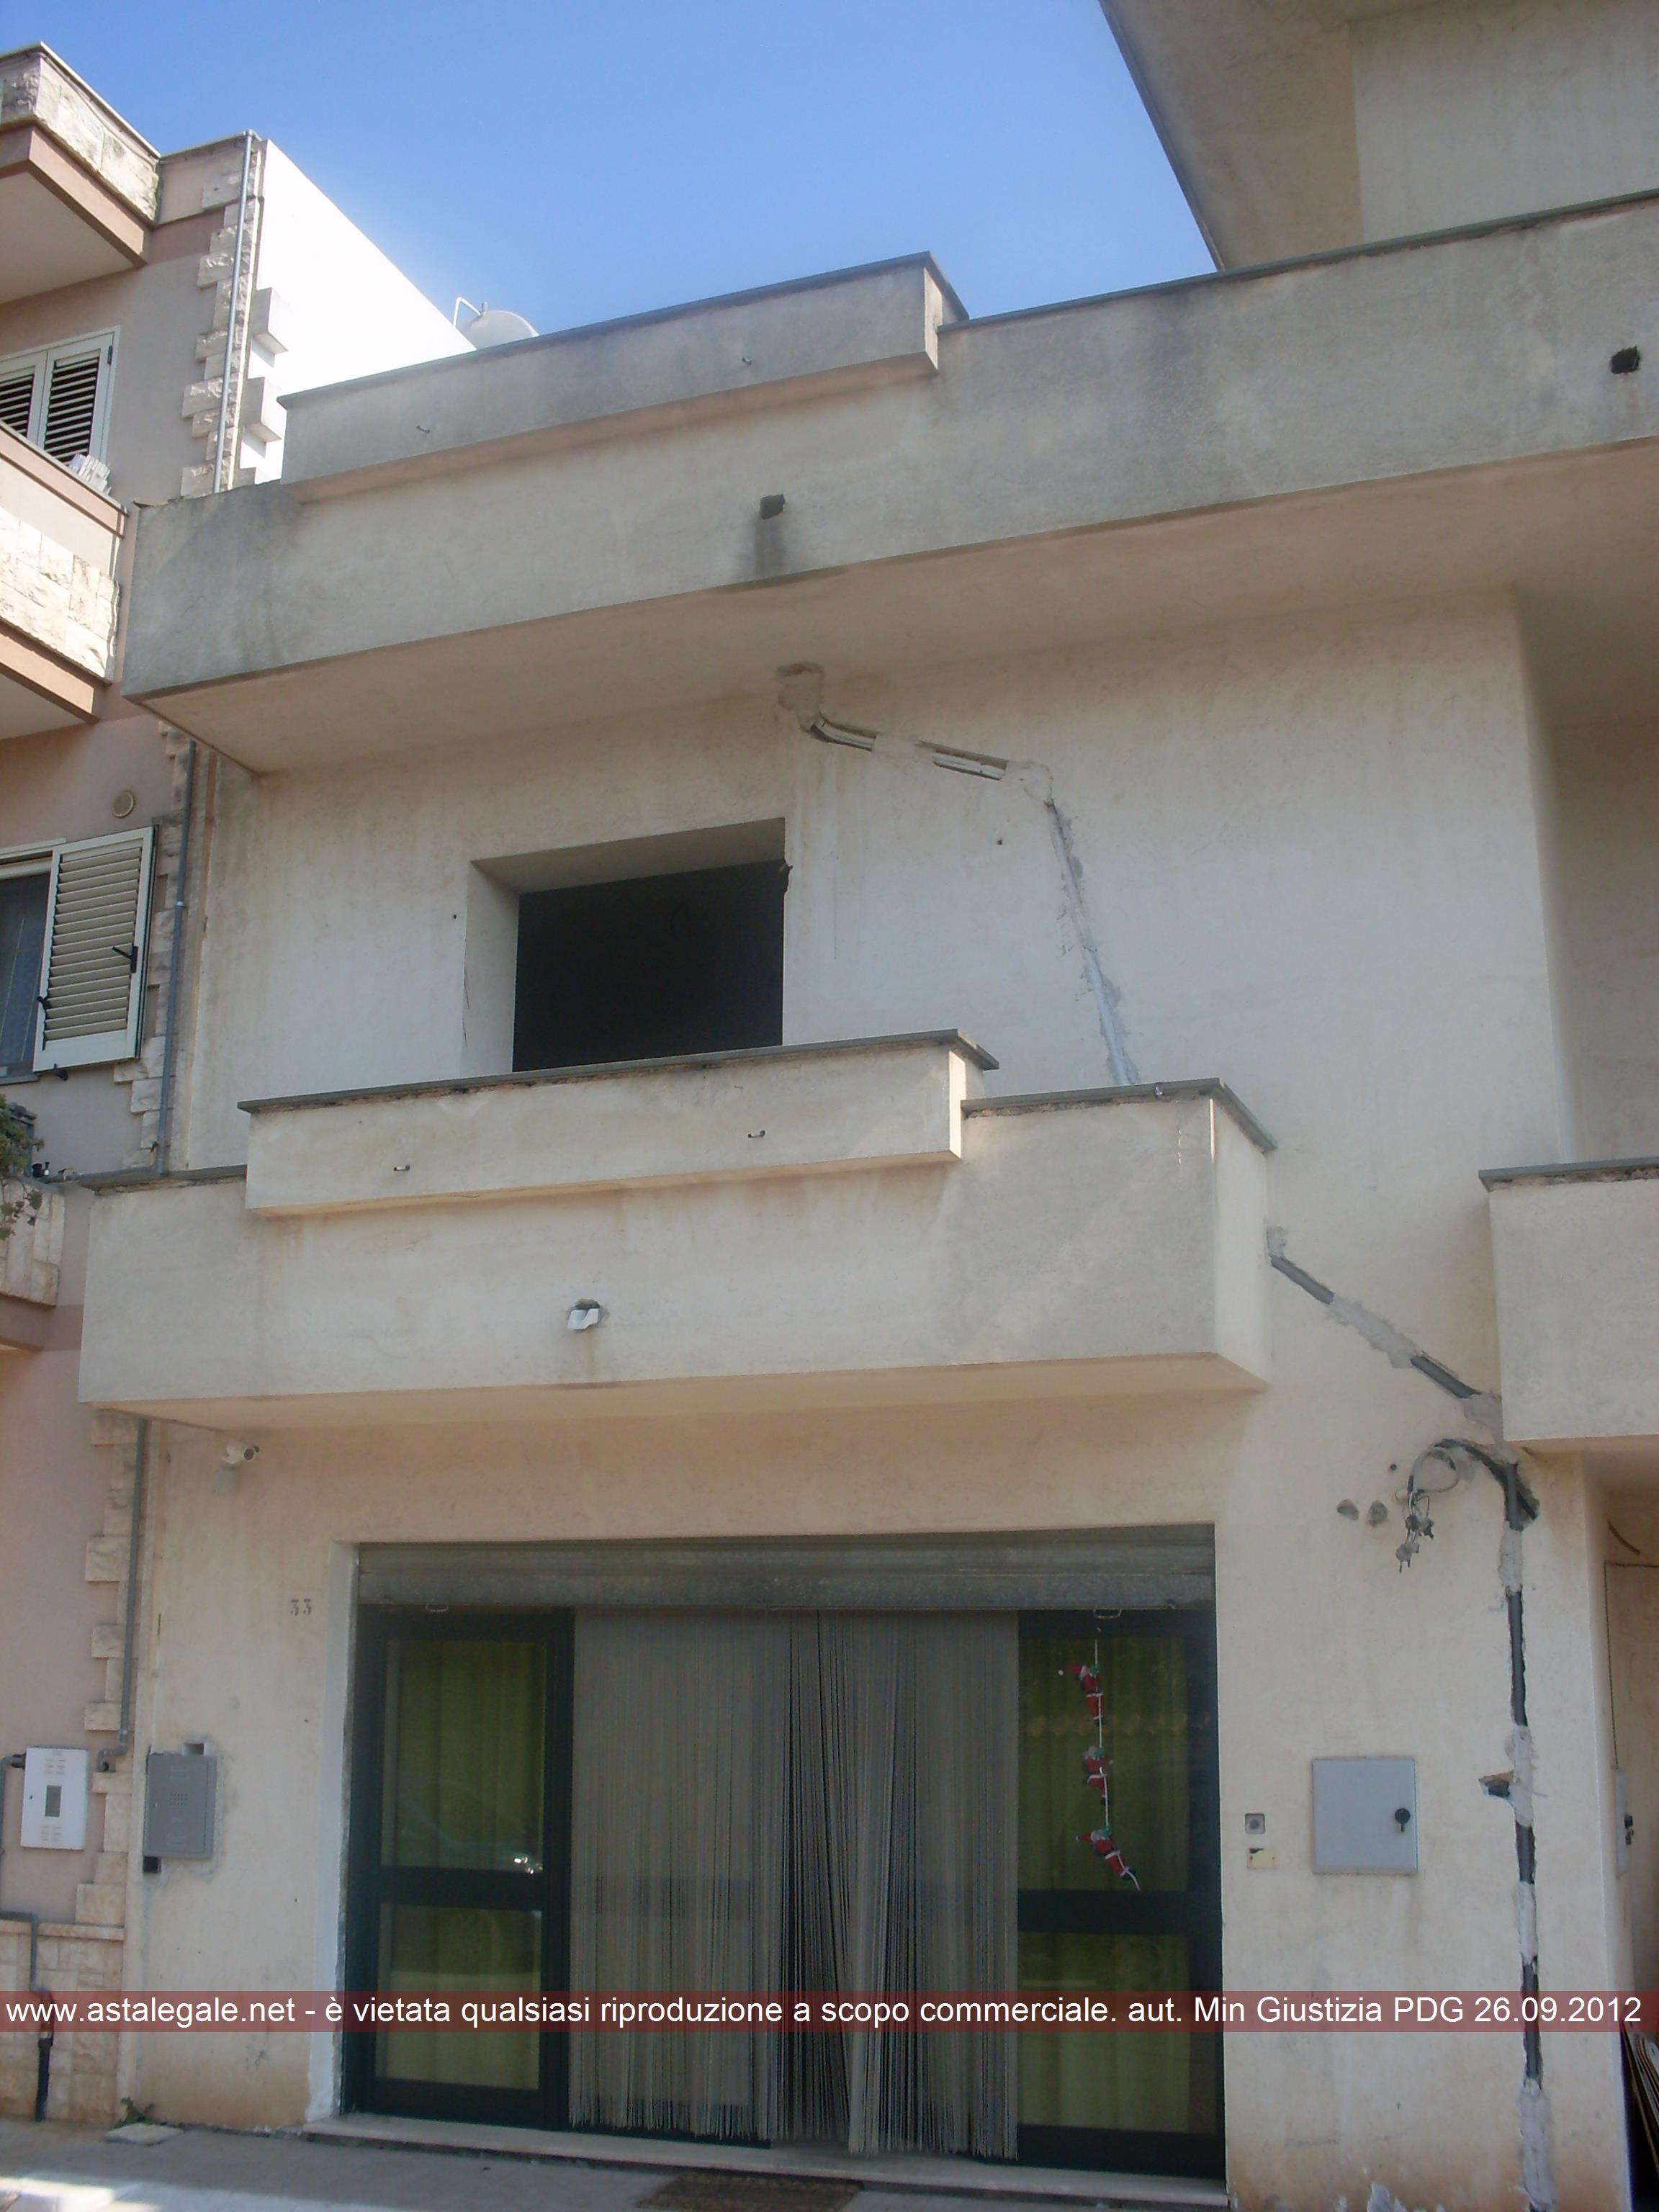 Carovigno (BR) Via Francesco Conforti 33